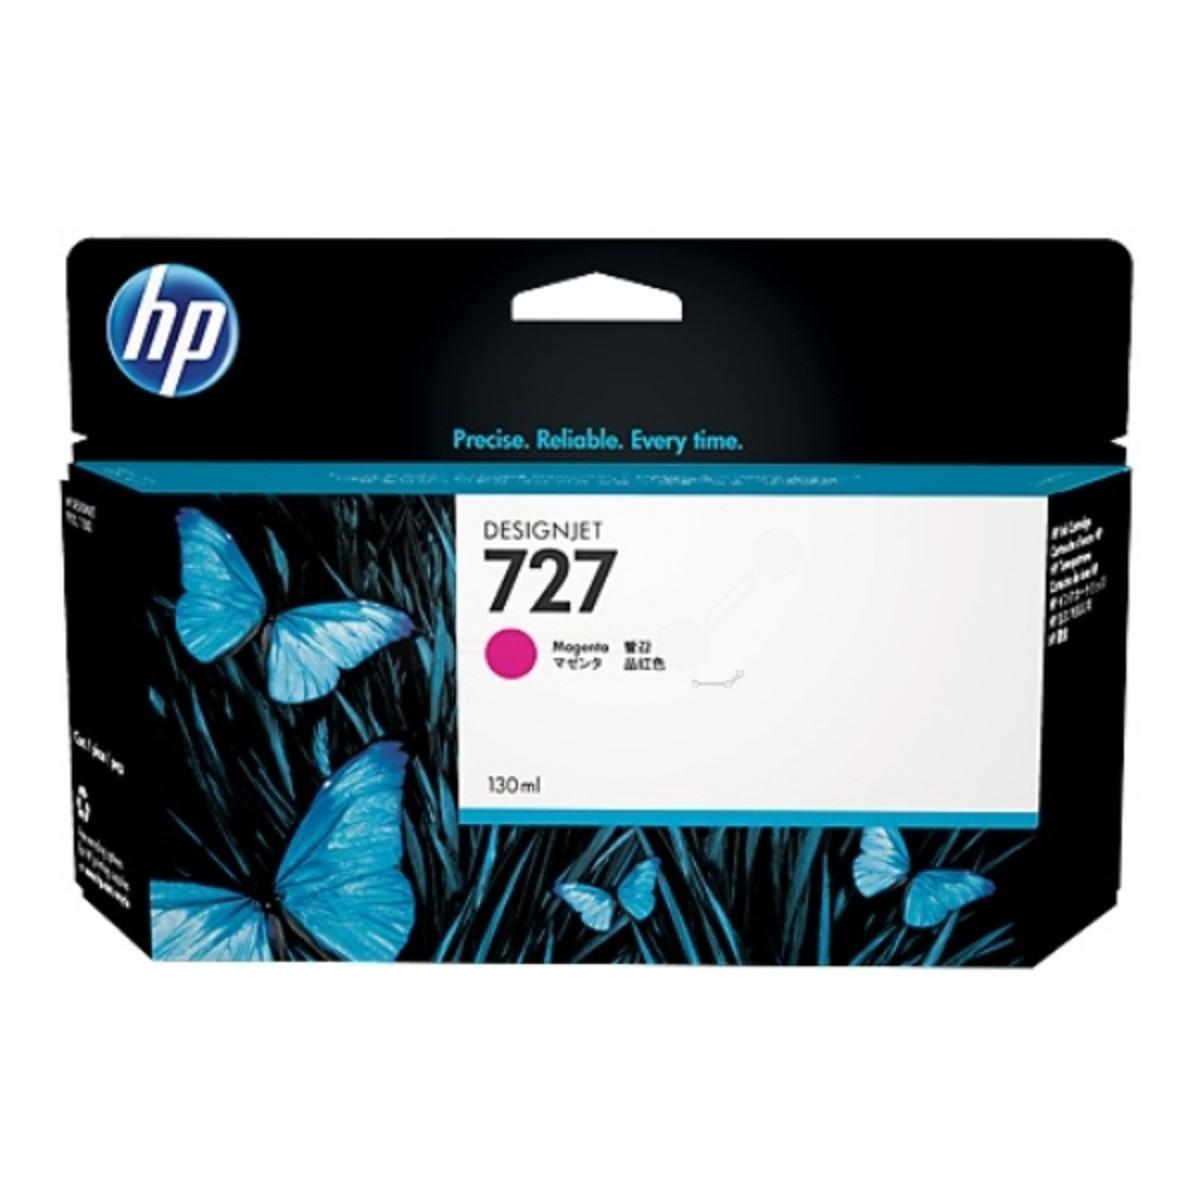 HP 727 (B3P20A) Magenta Ink Cartridge - 130ml